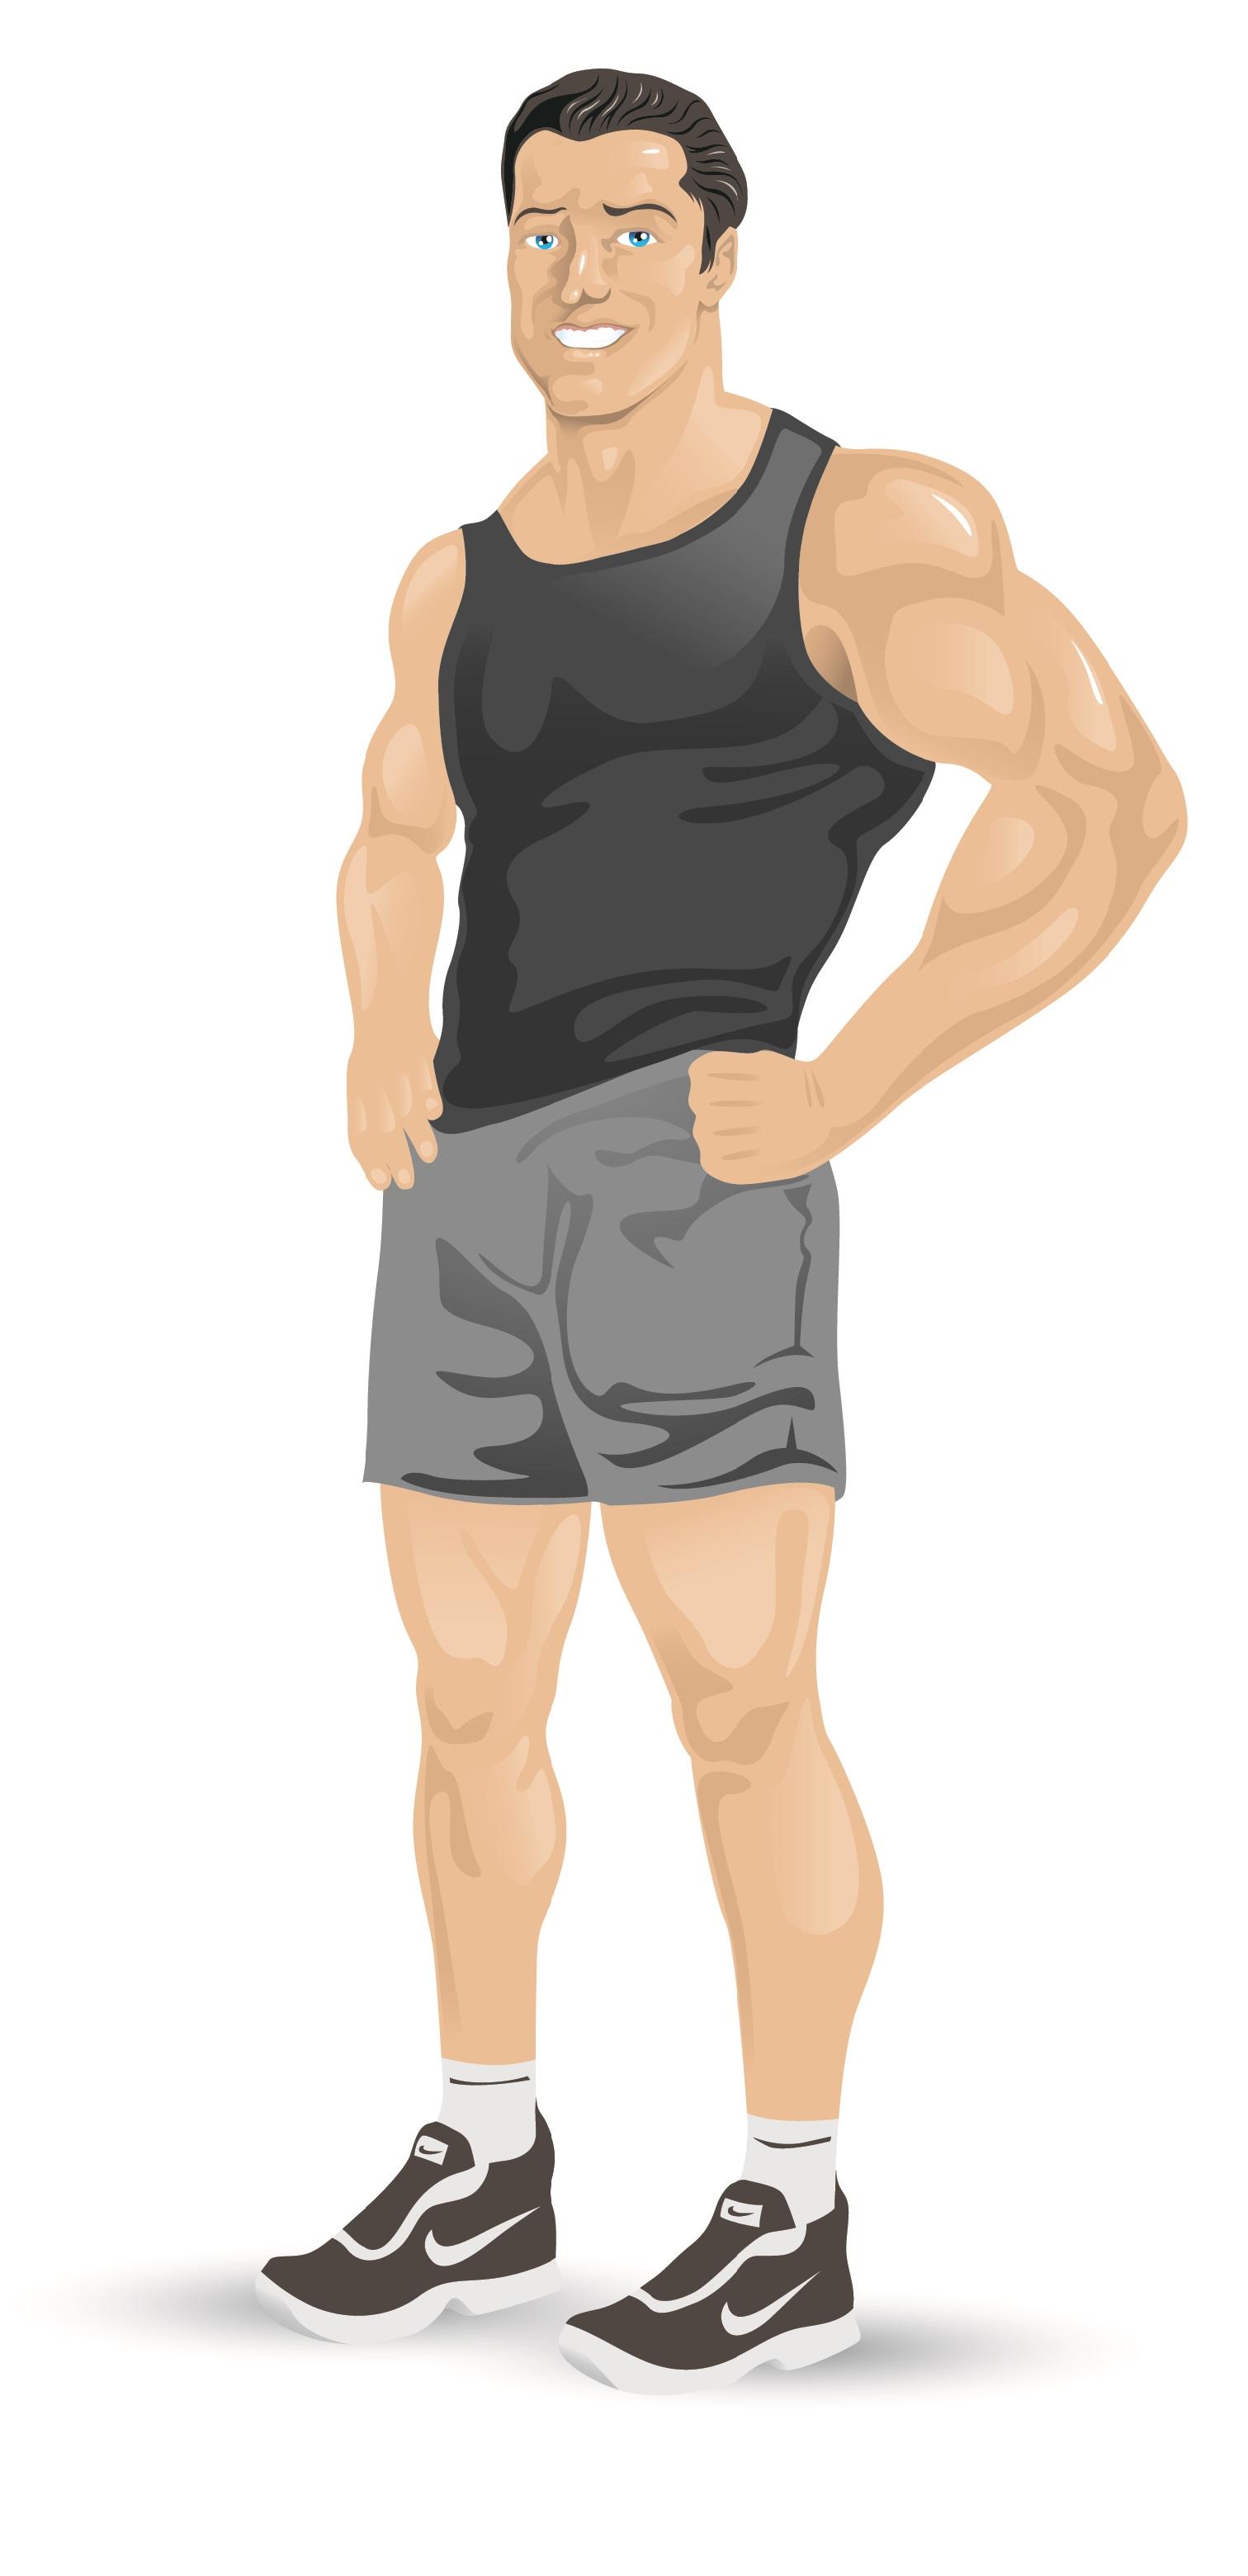 Fitness Trainer Mascot